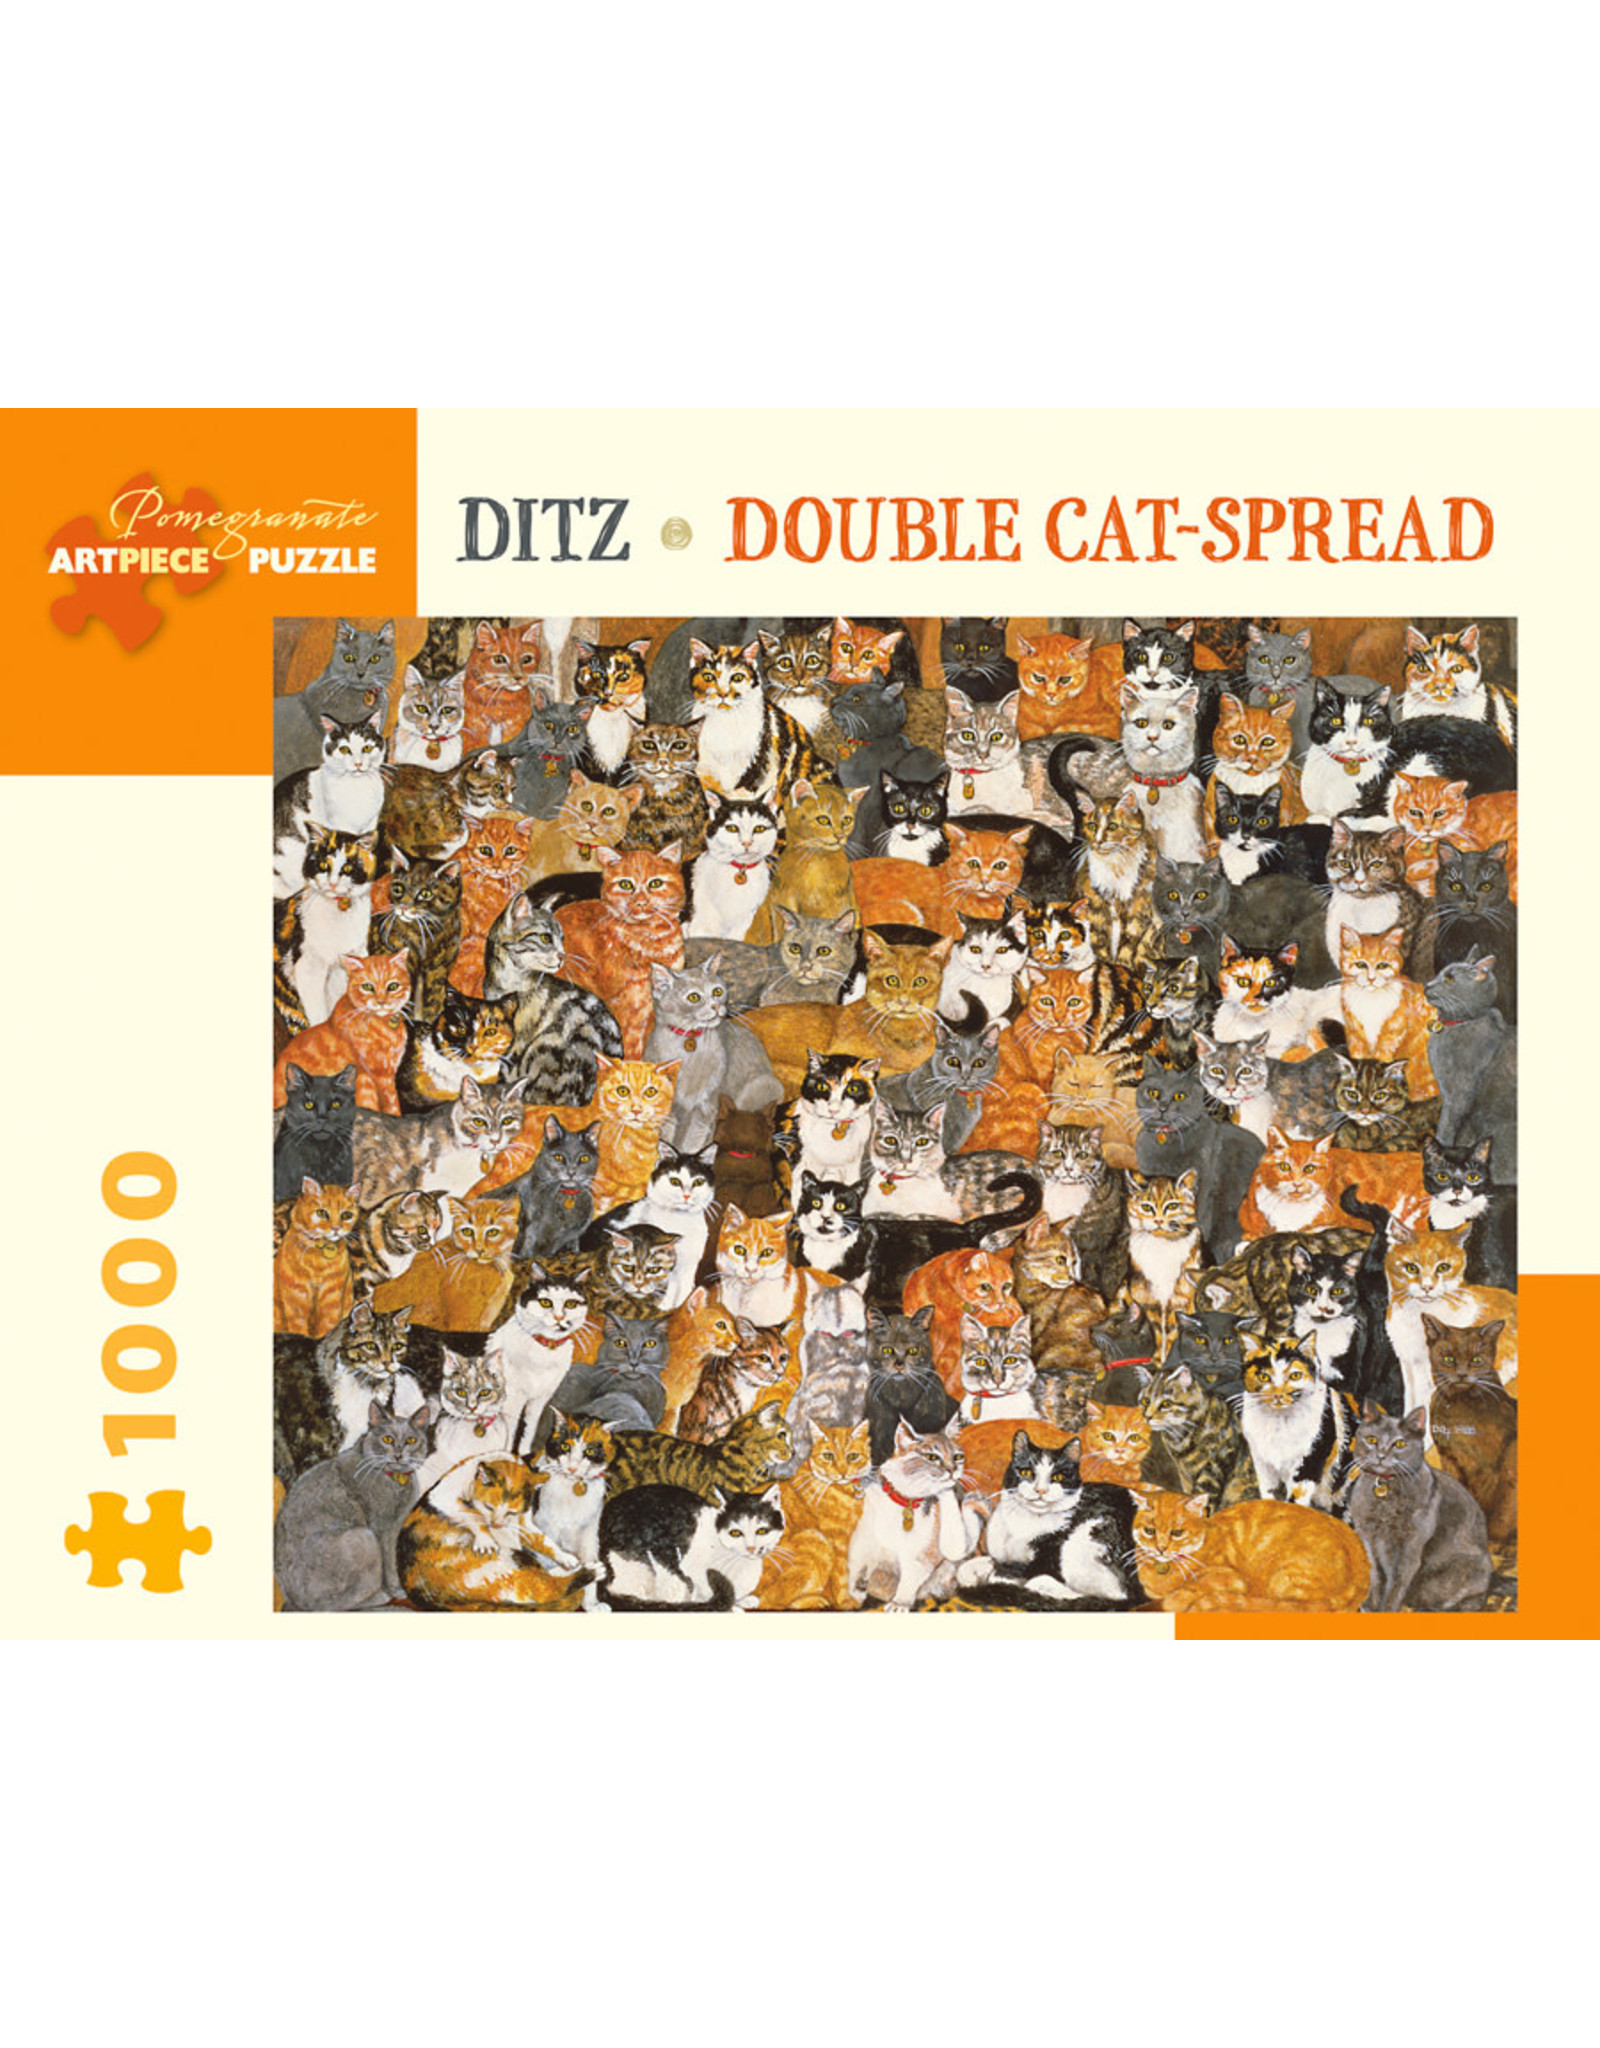 DITZ DOUBLE CAT SPREAD 1000 PIECE PUZZLE